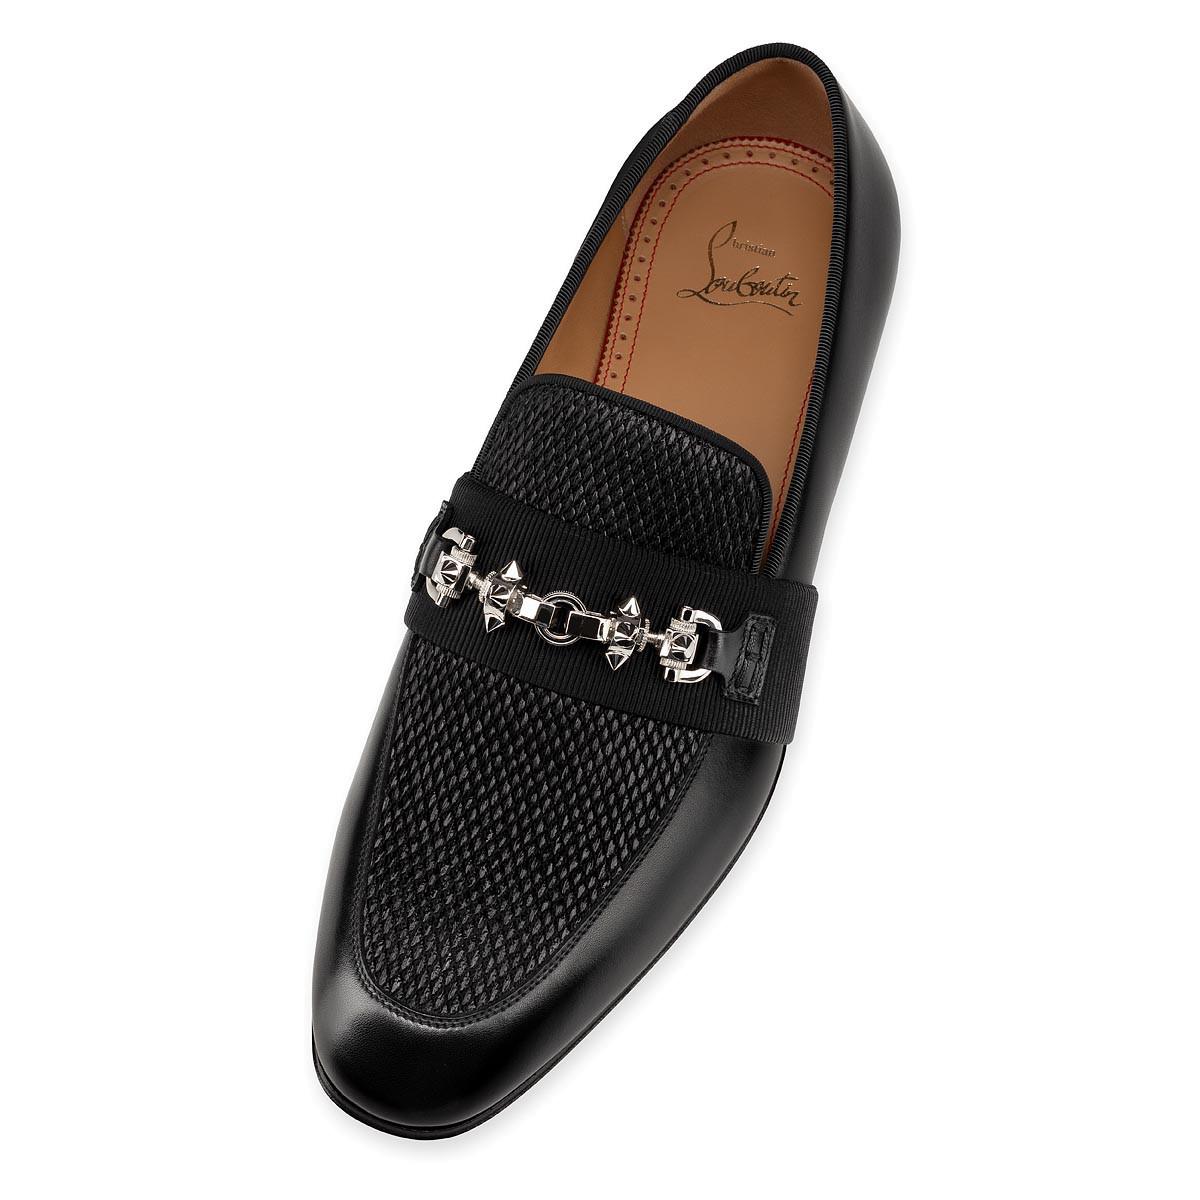 Shoes - Panamax - Christian Louboutin